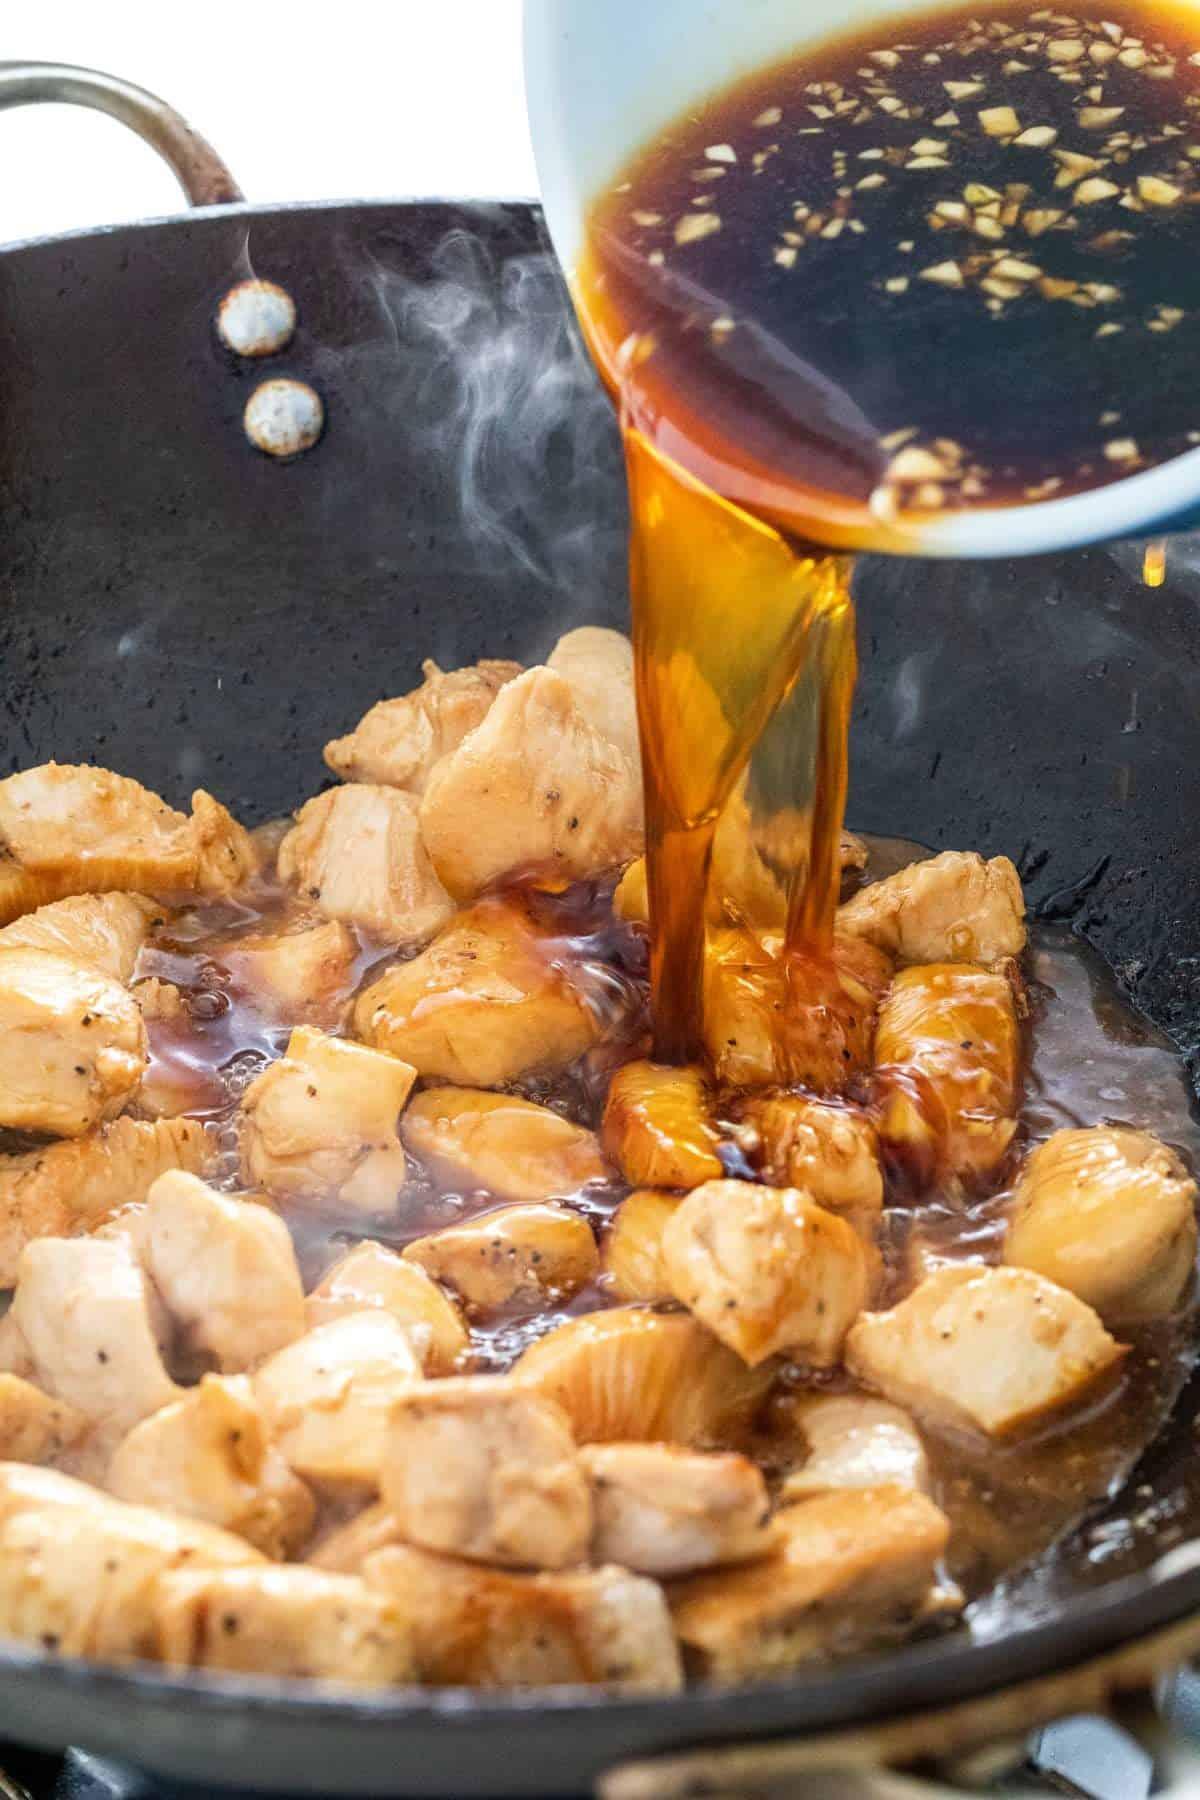 adding the teriyaki sauce to the pan of chicken